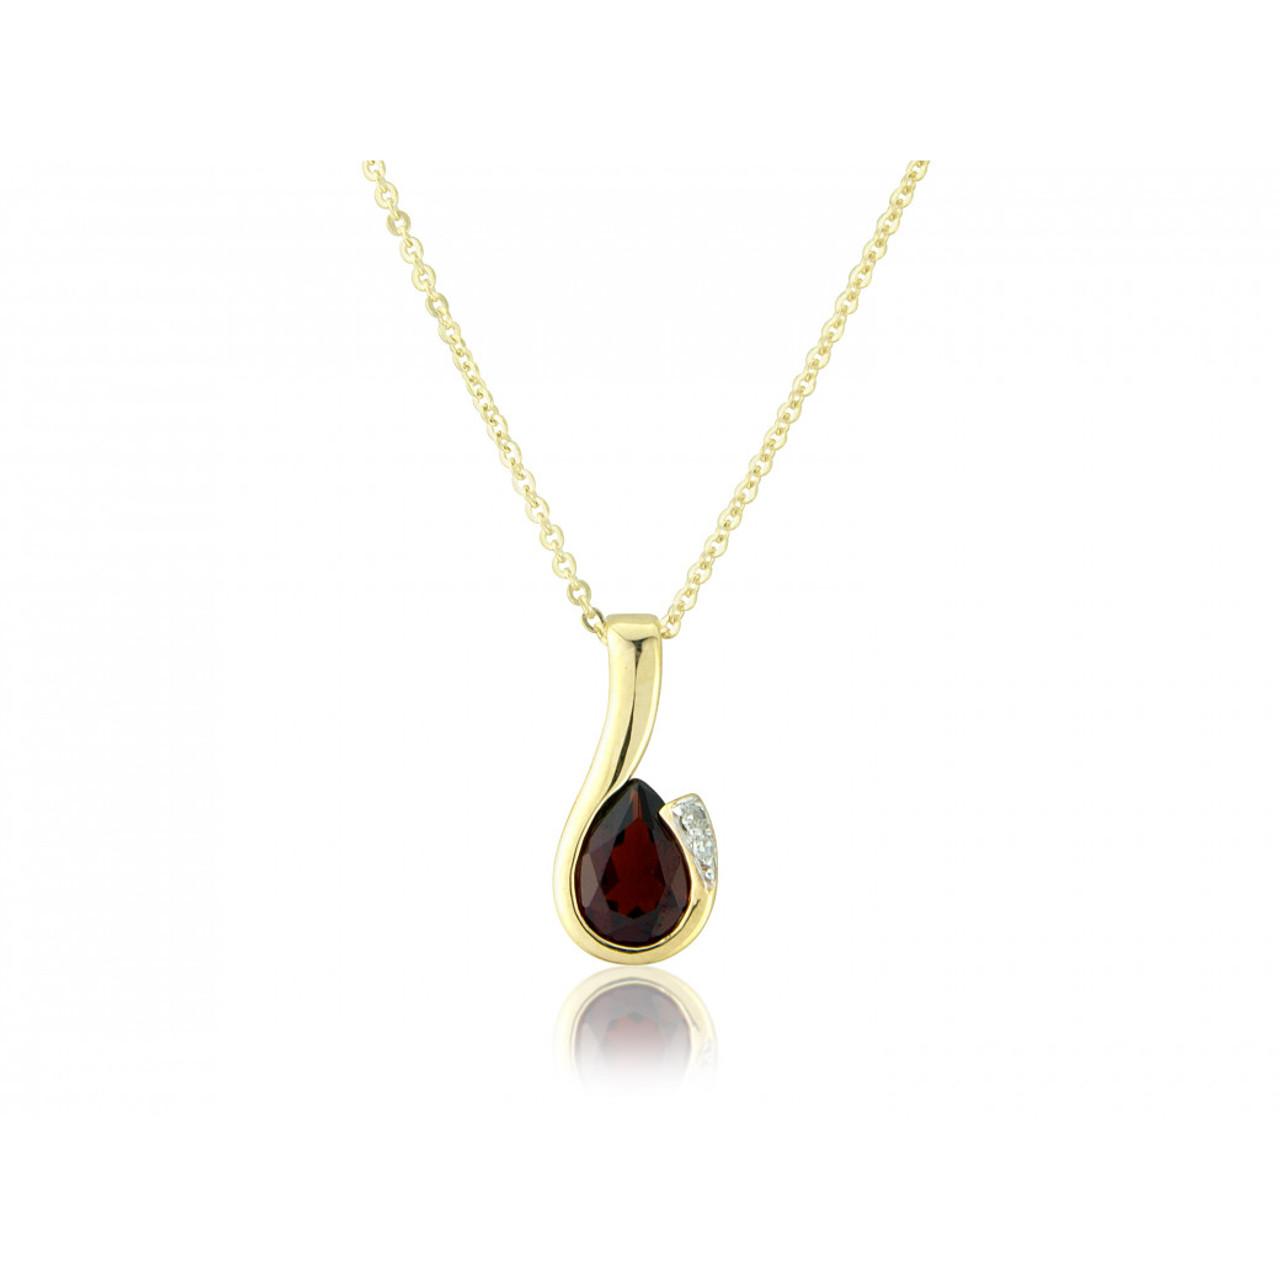 9ct Yellow Gold Garnet & Diamond Curl Pendant Necklace